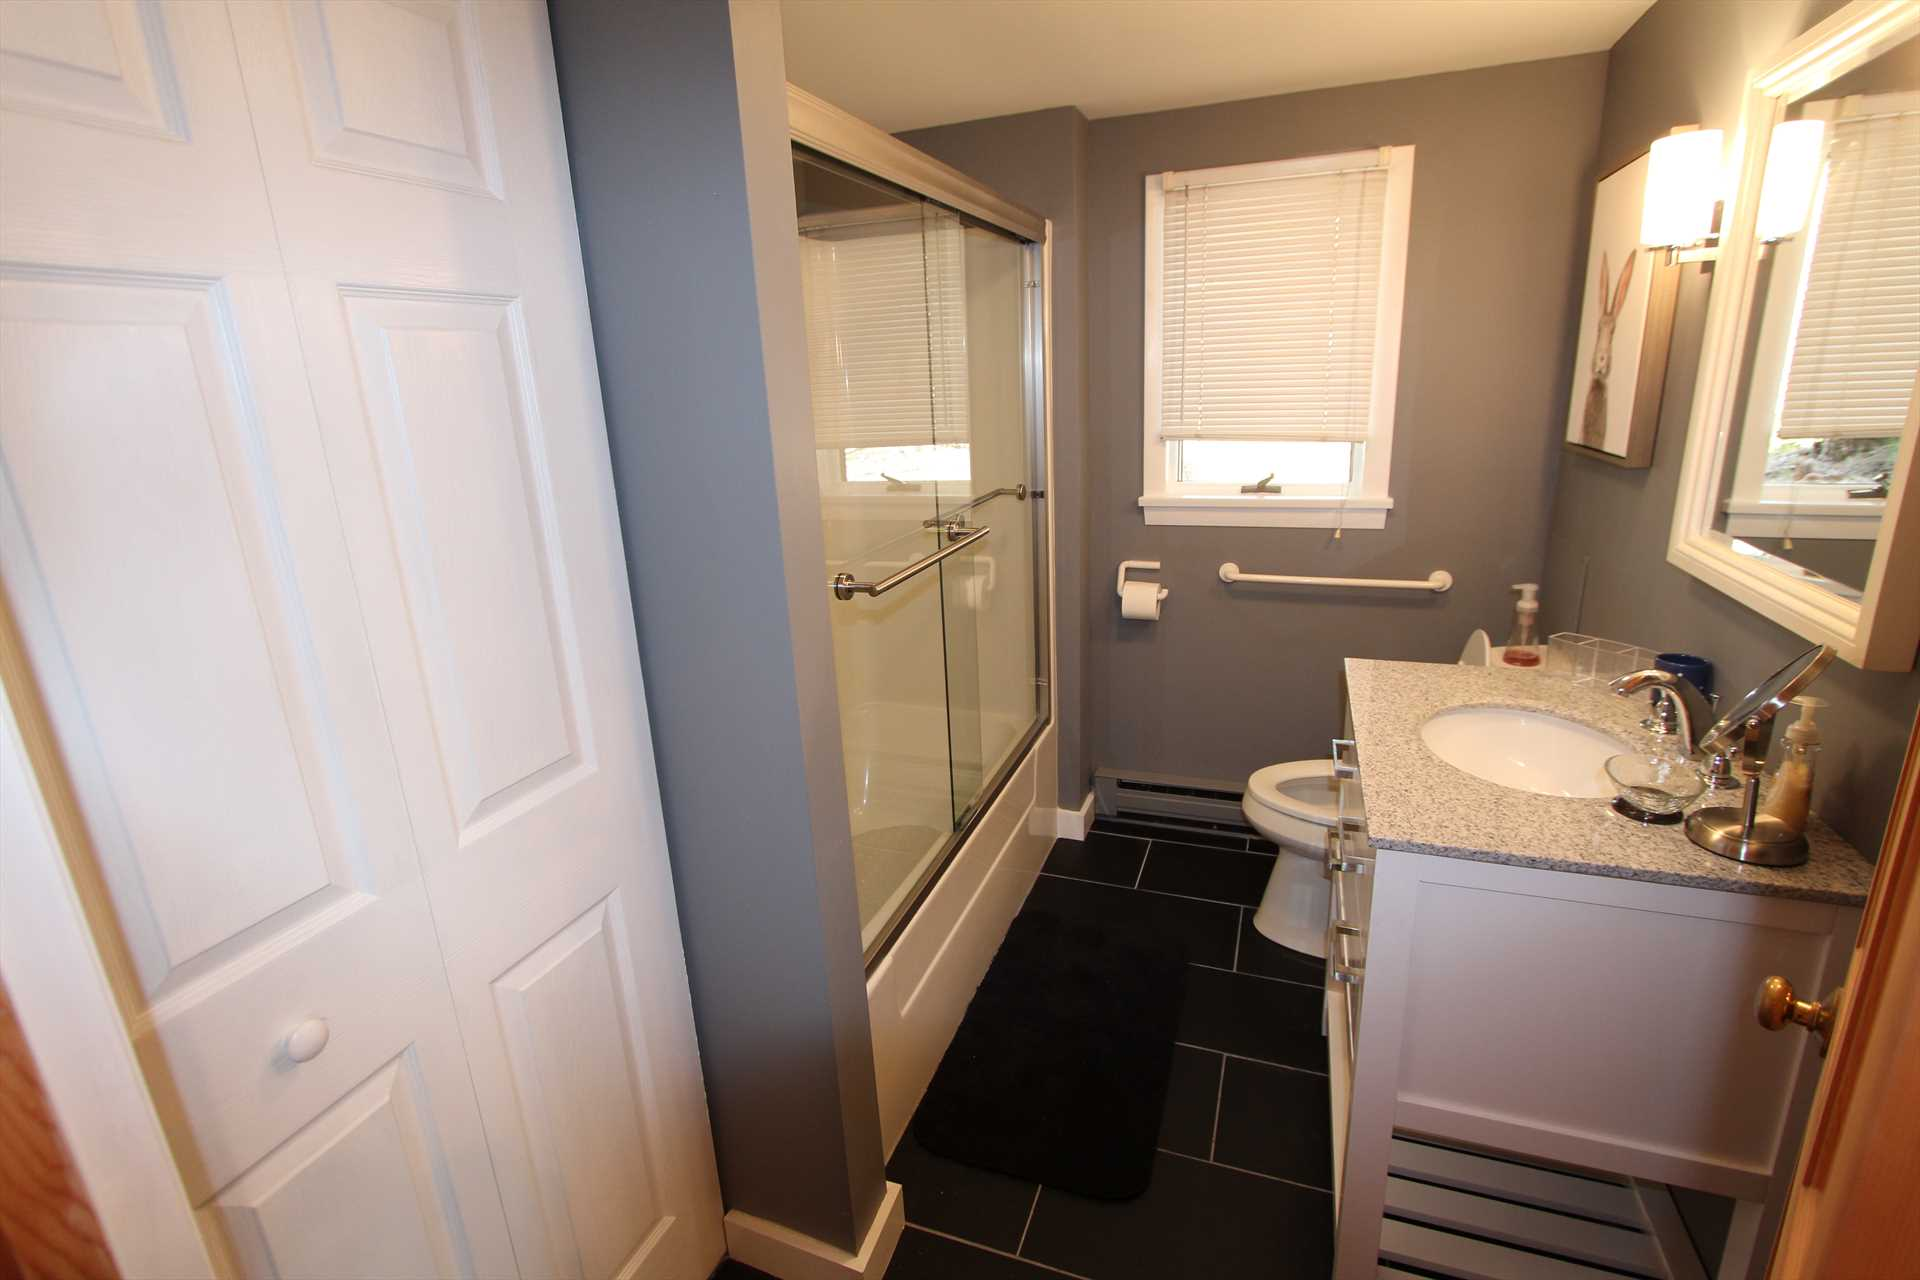 Bathroom Lower level with Tub & Shower